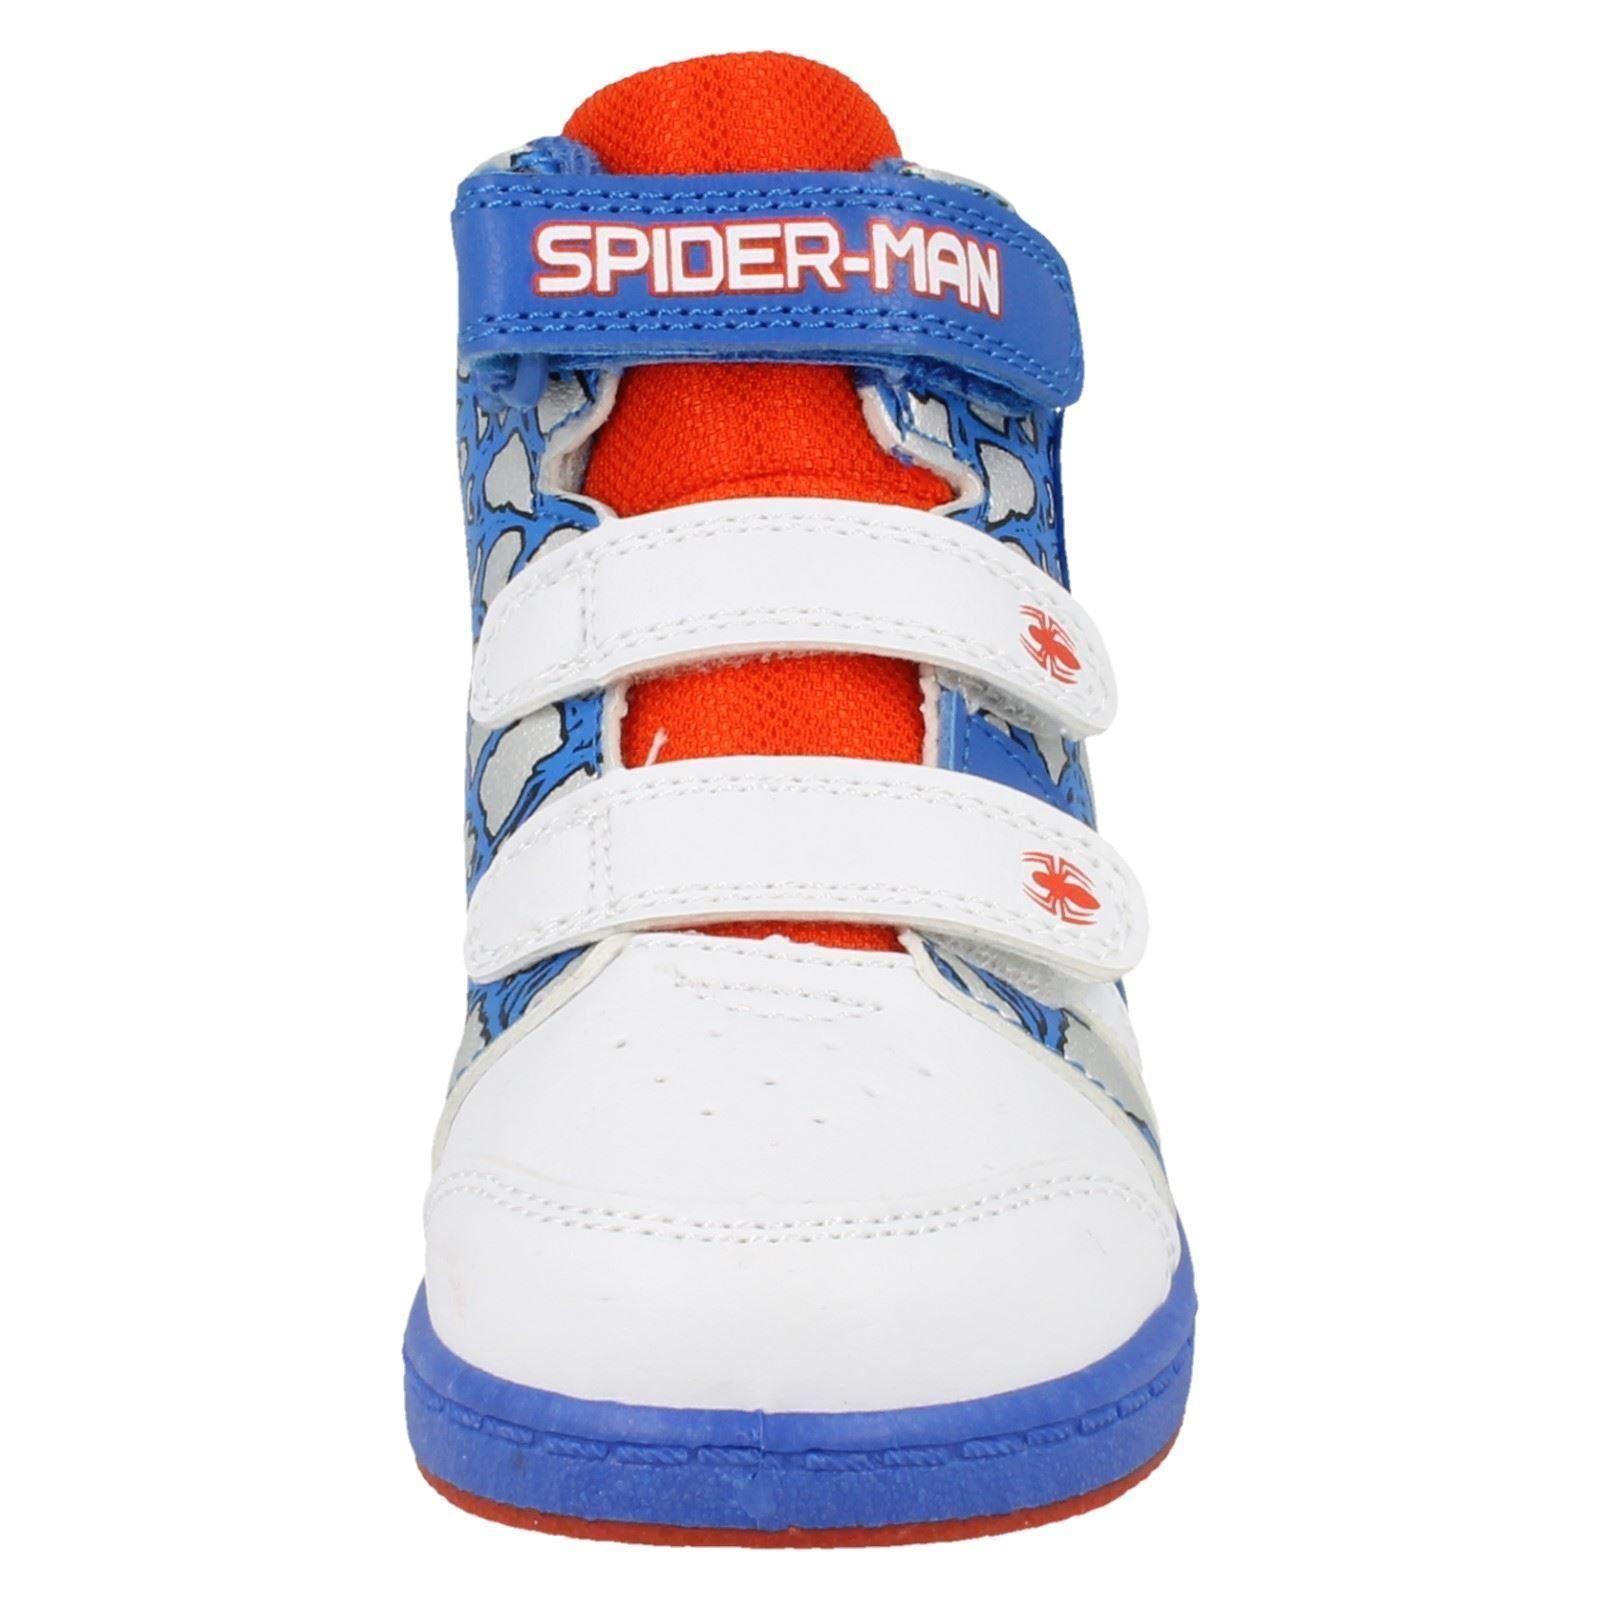 Chicos Marvel Spiderman Concourse Hi Top Trainer